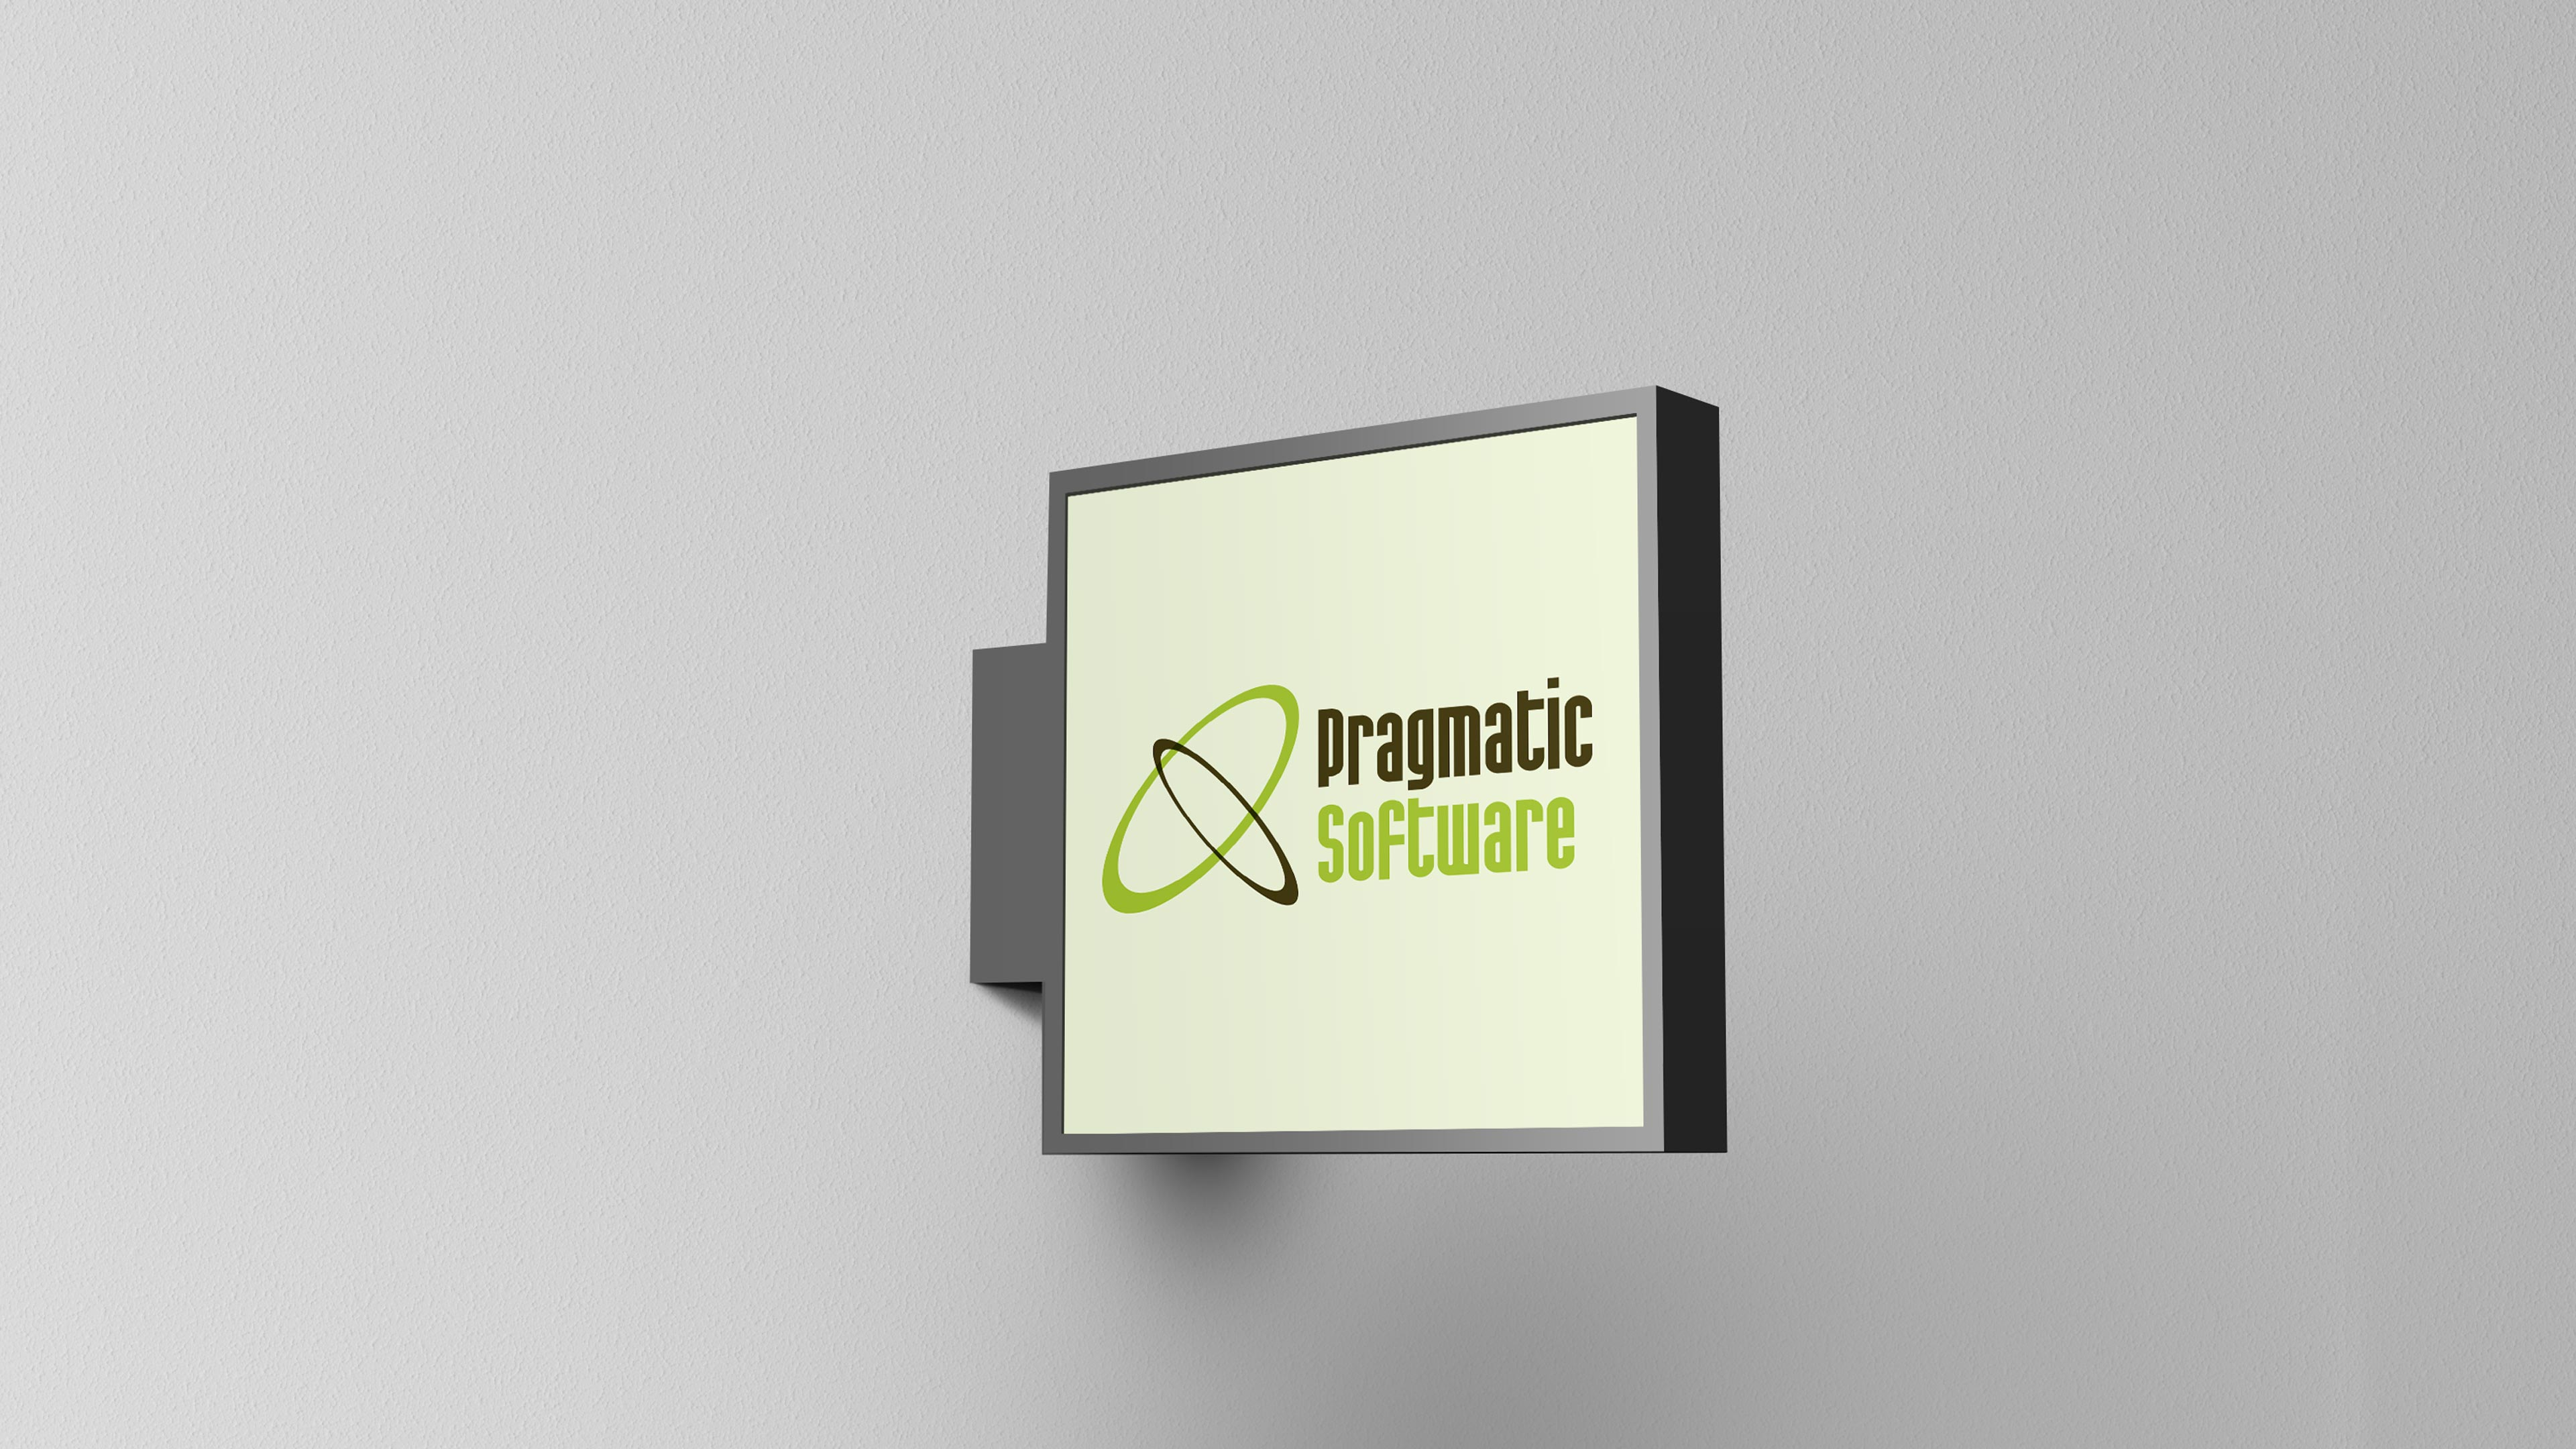 Pragmatic Software